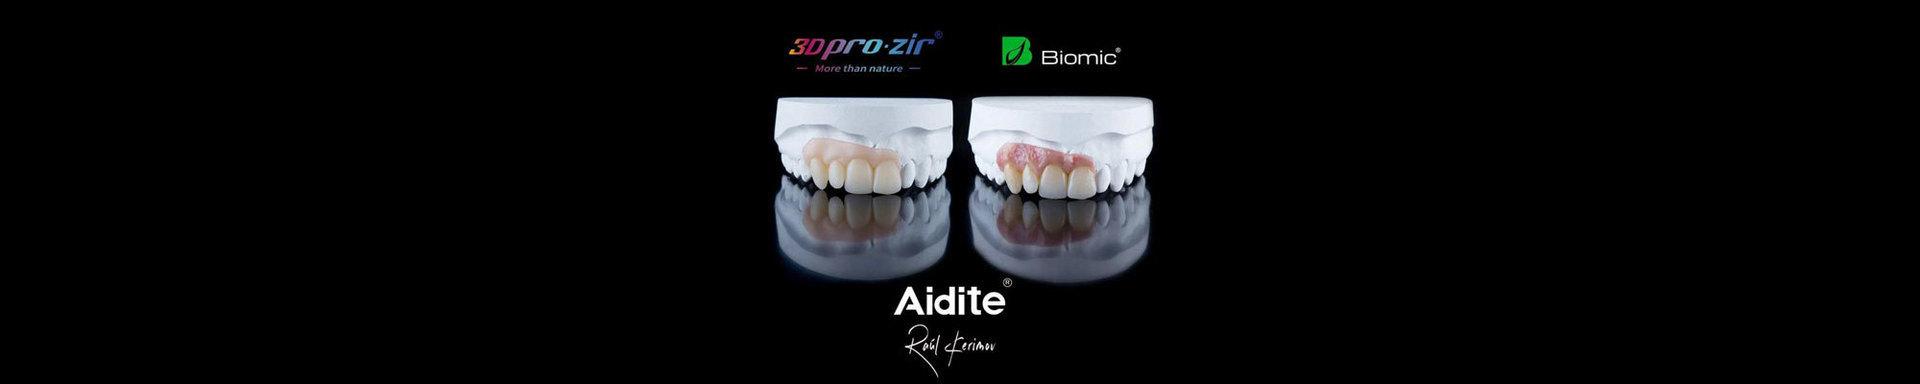 XV Dental - Specialisation dentaire